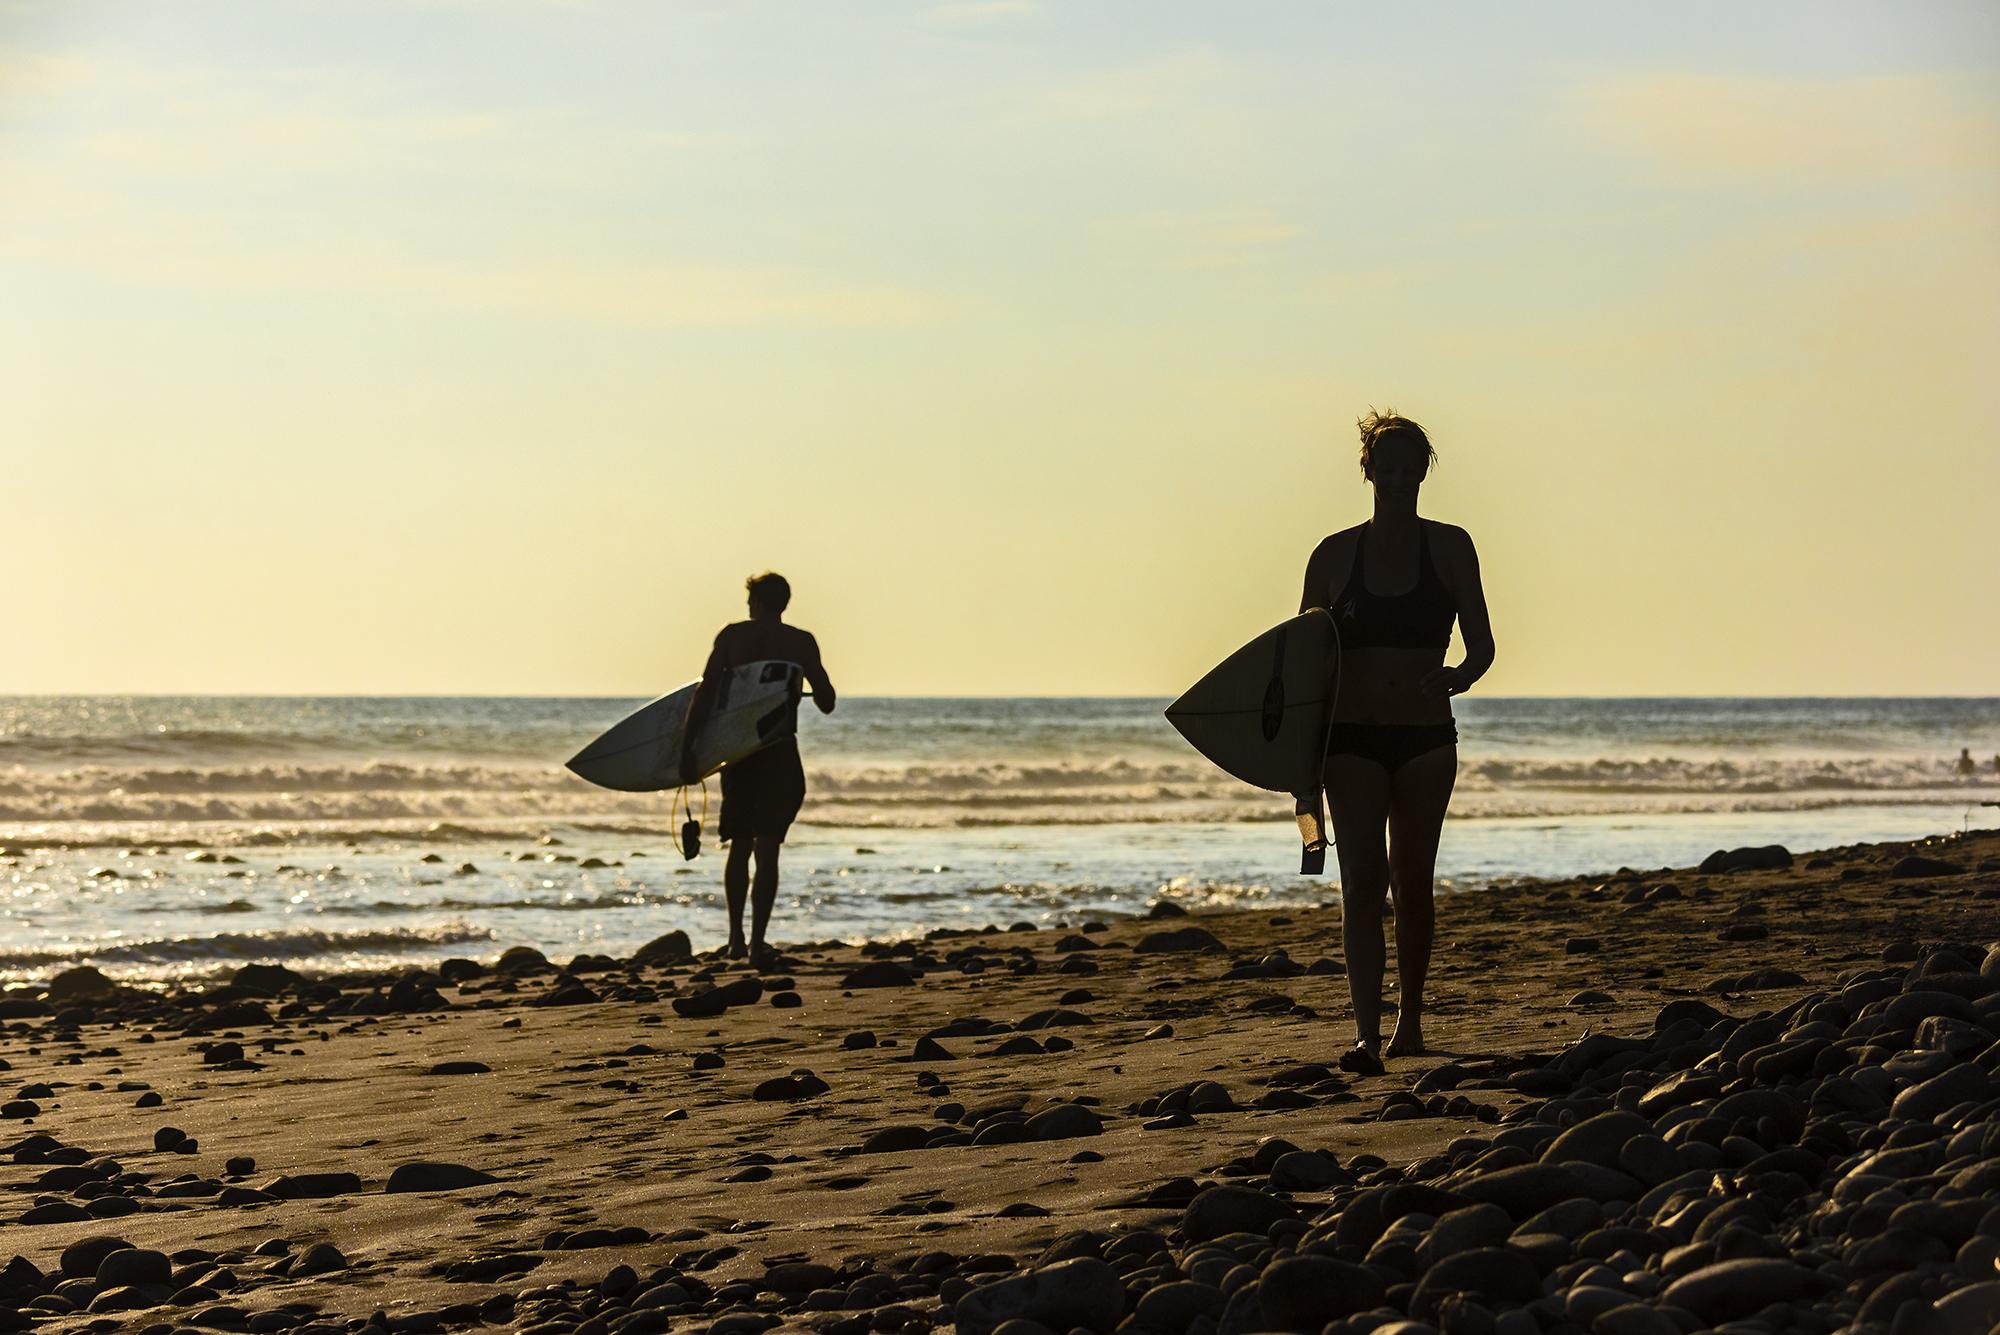 Playa El Pimental El Salvador